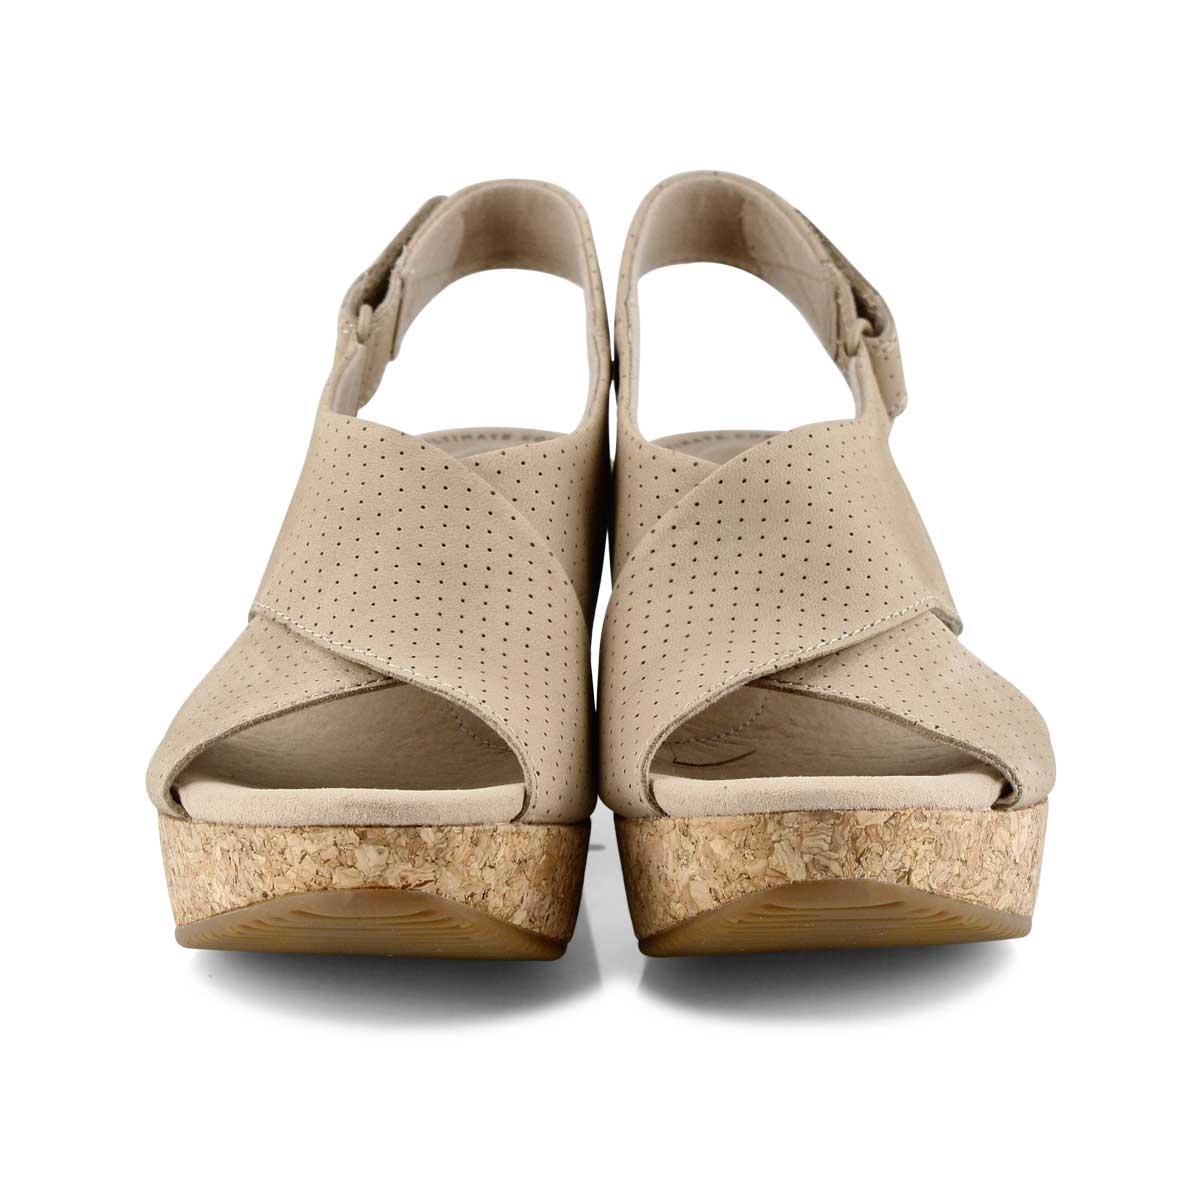 Lds Annadel Parker sand wedge sandal